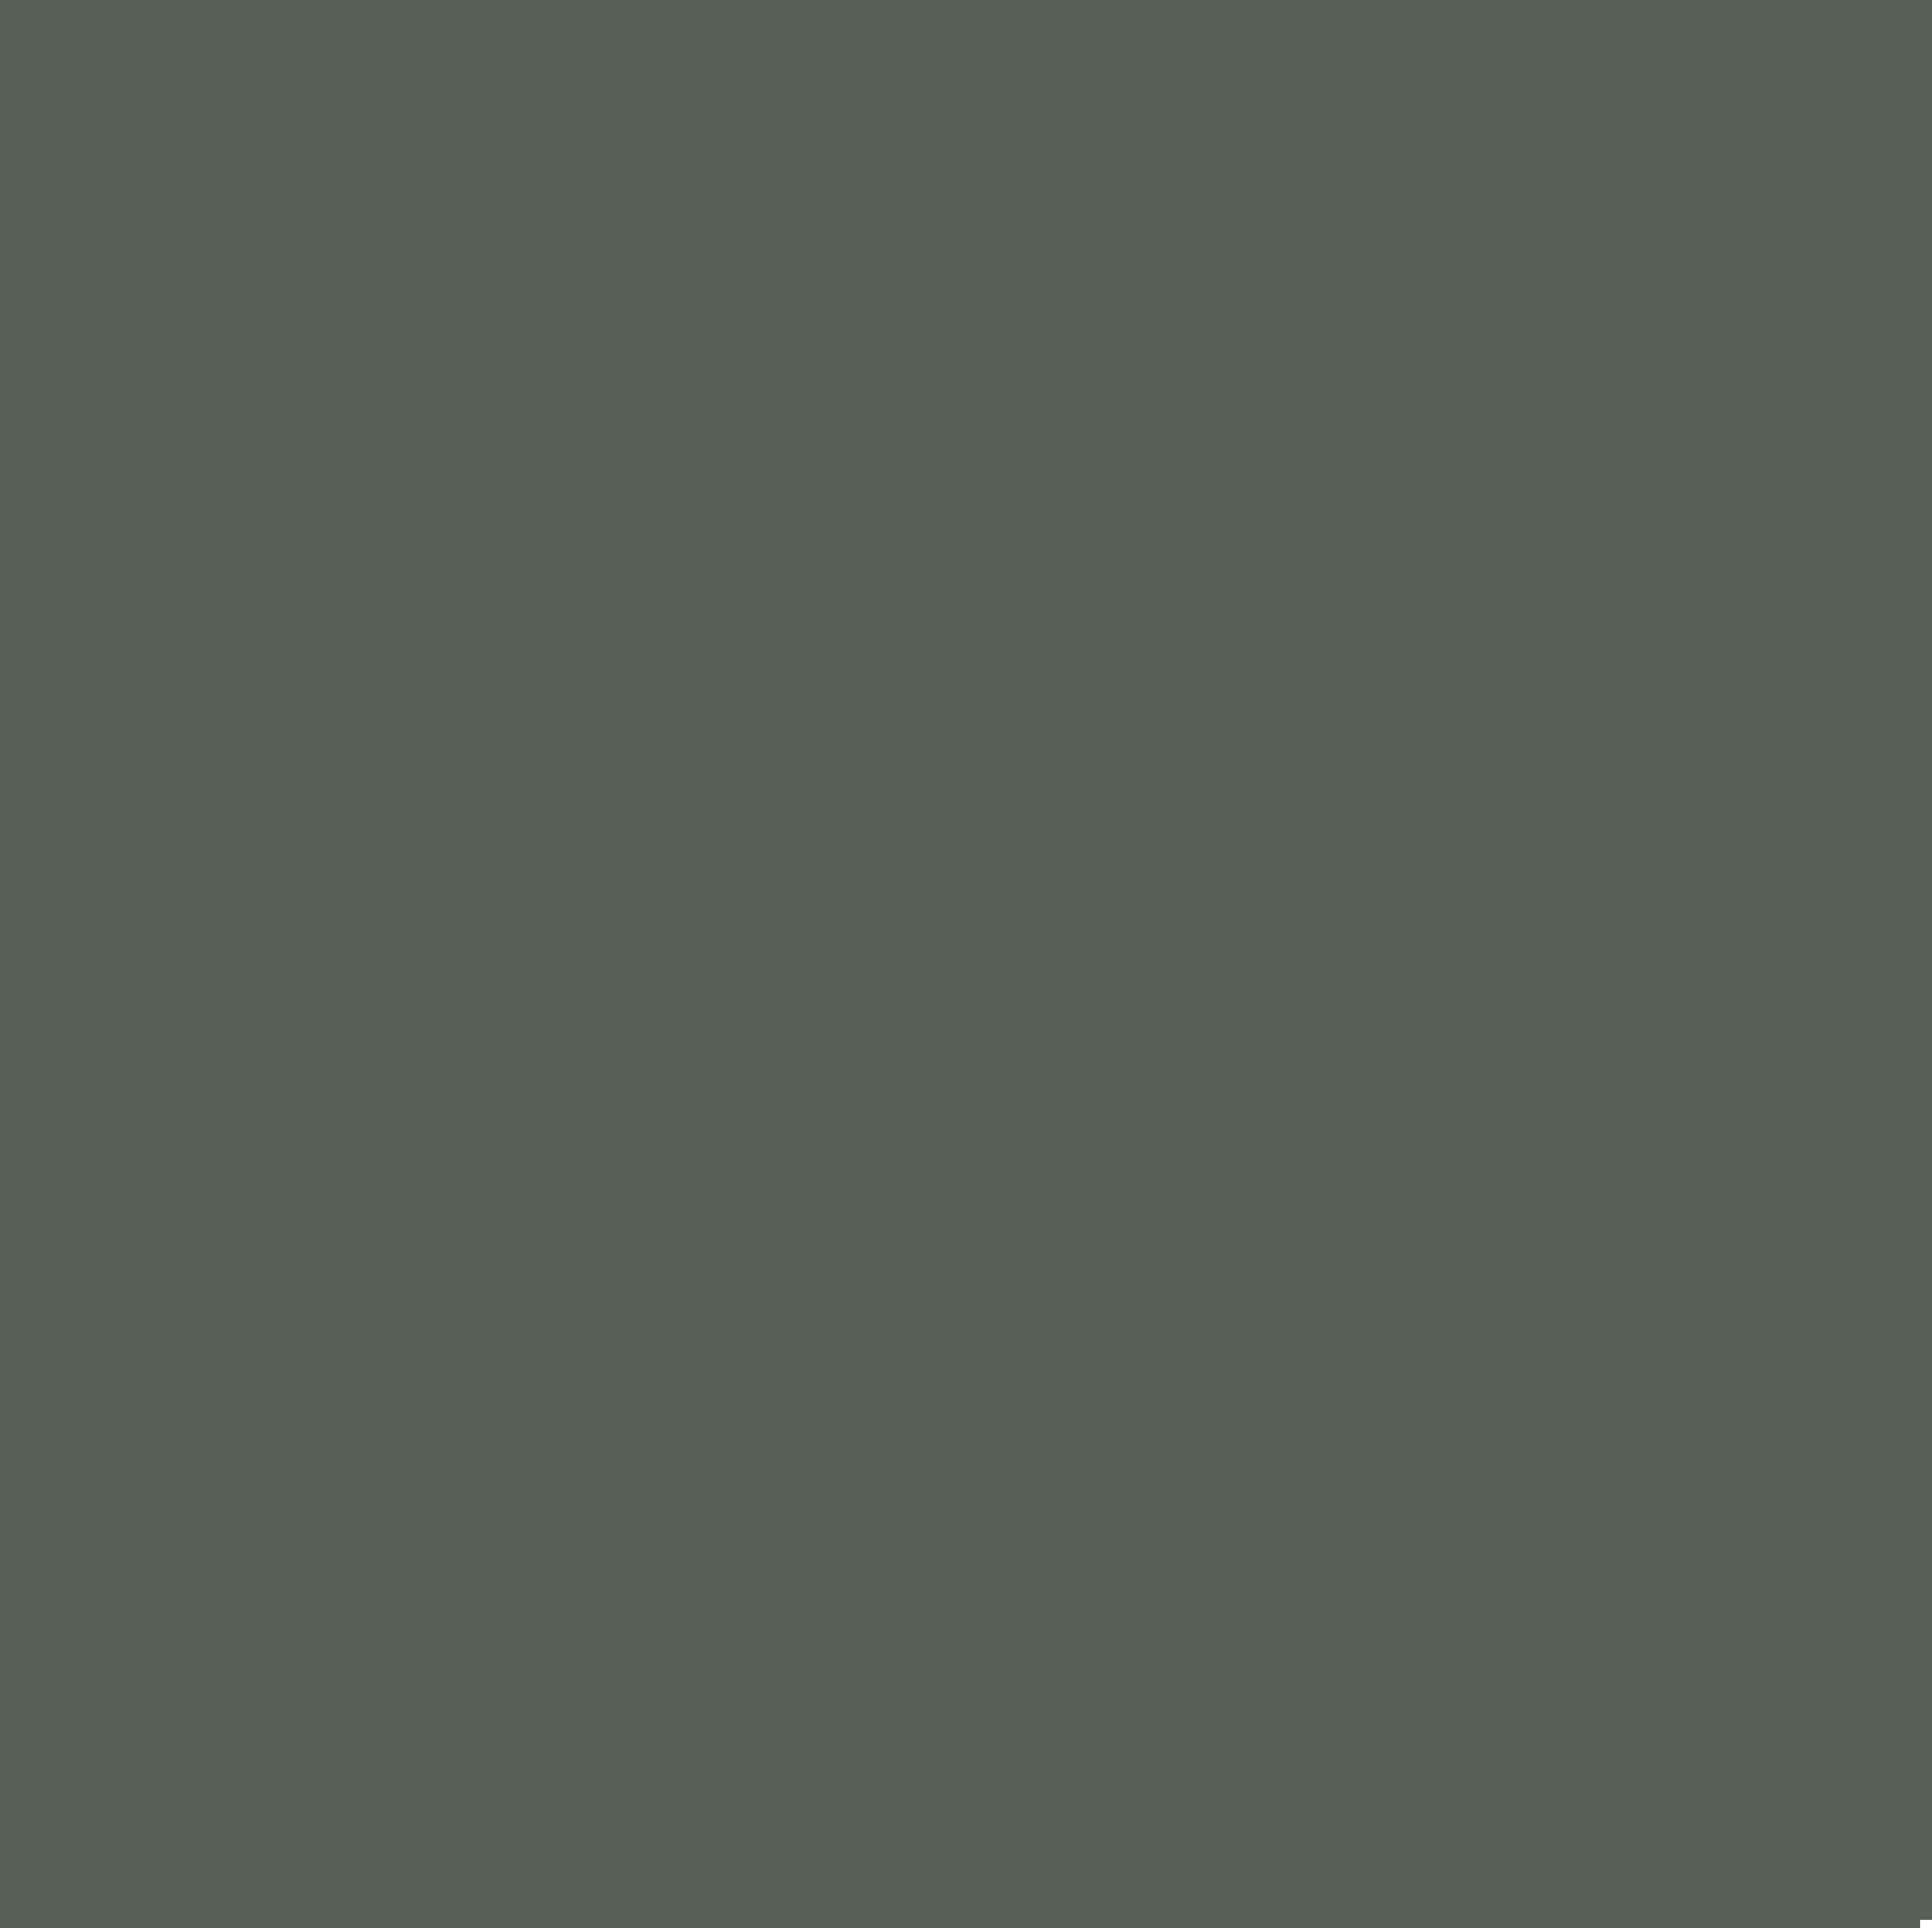 527-5270931_clip-art-instagram-computer-icons-logo-symbol-png